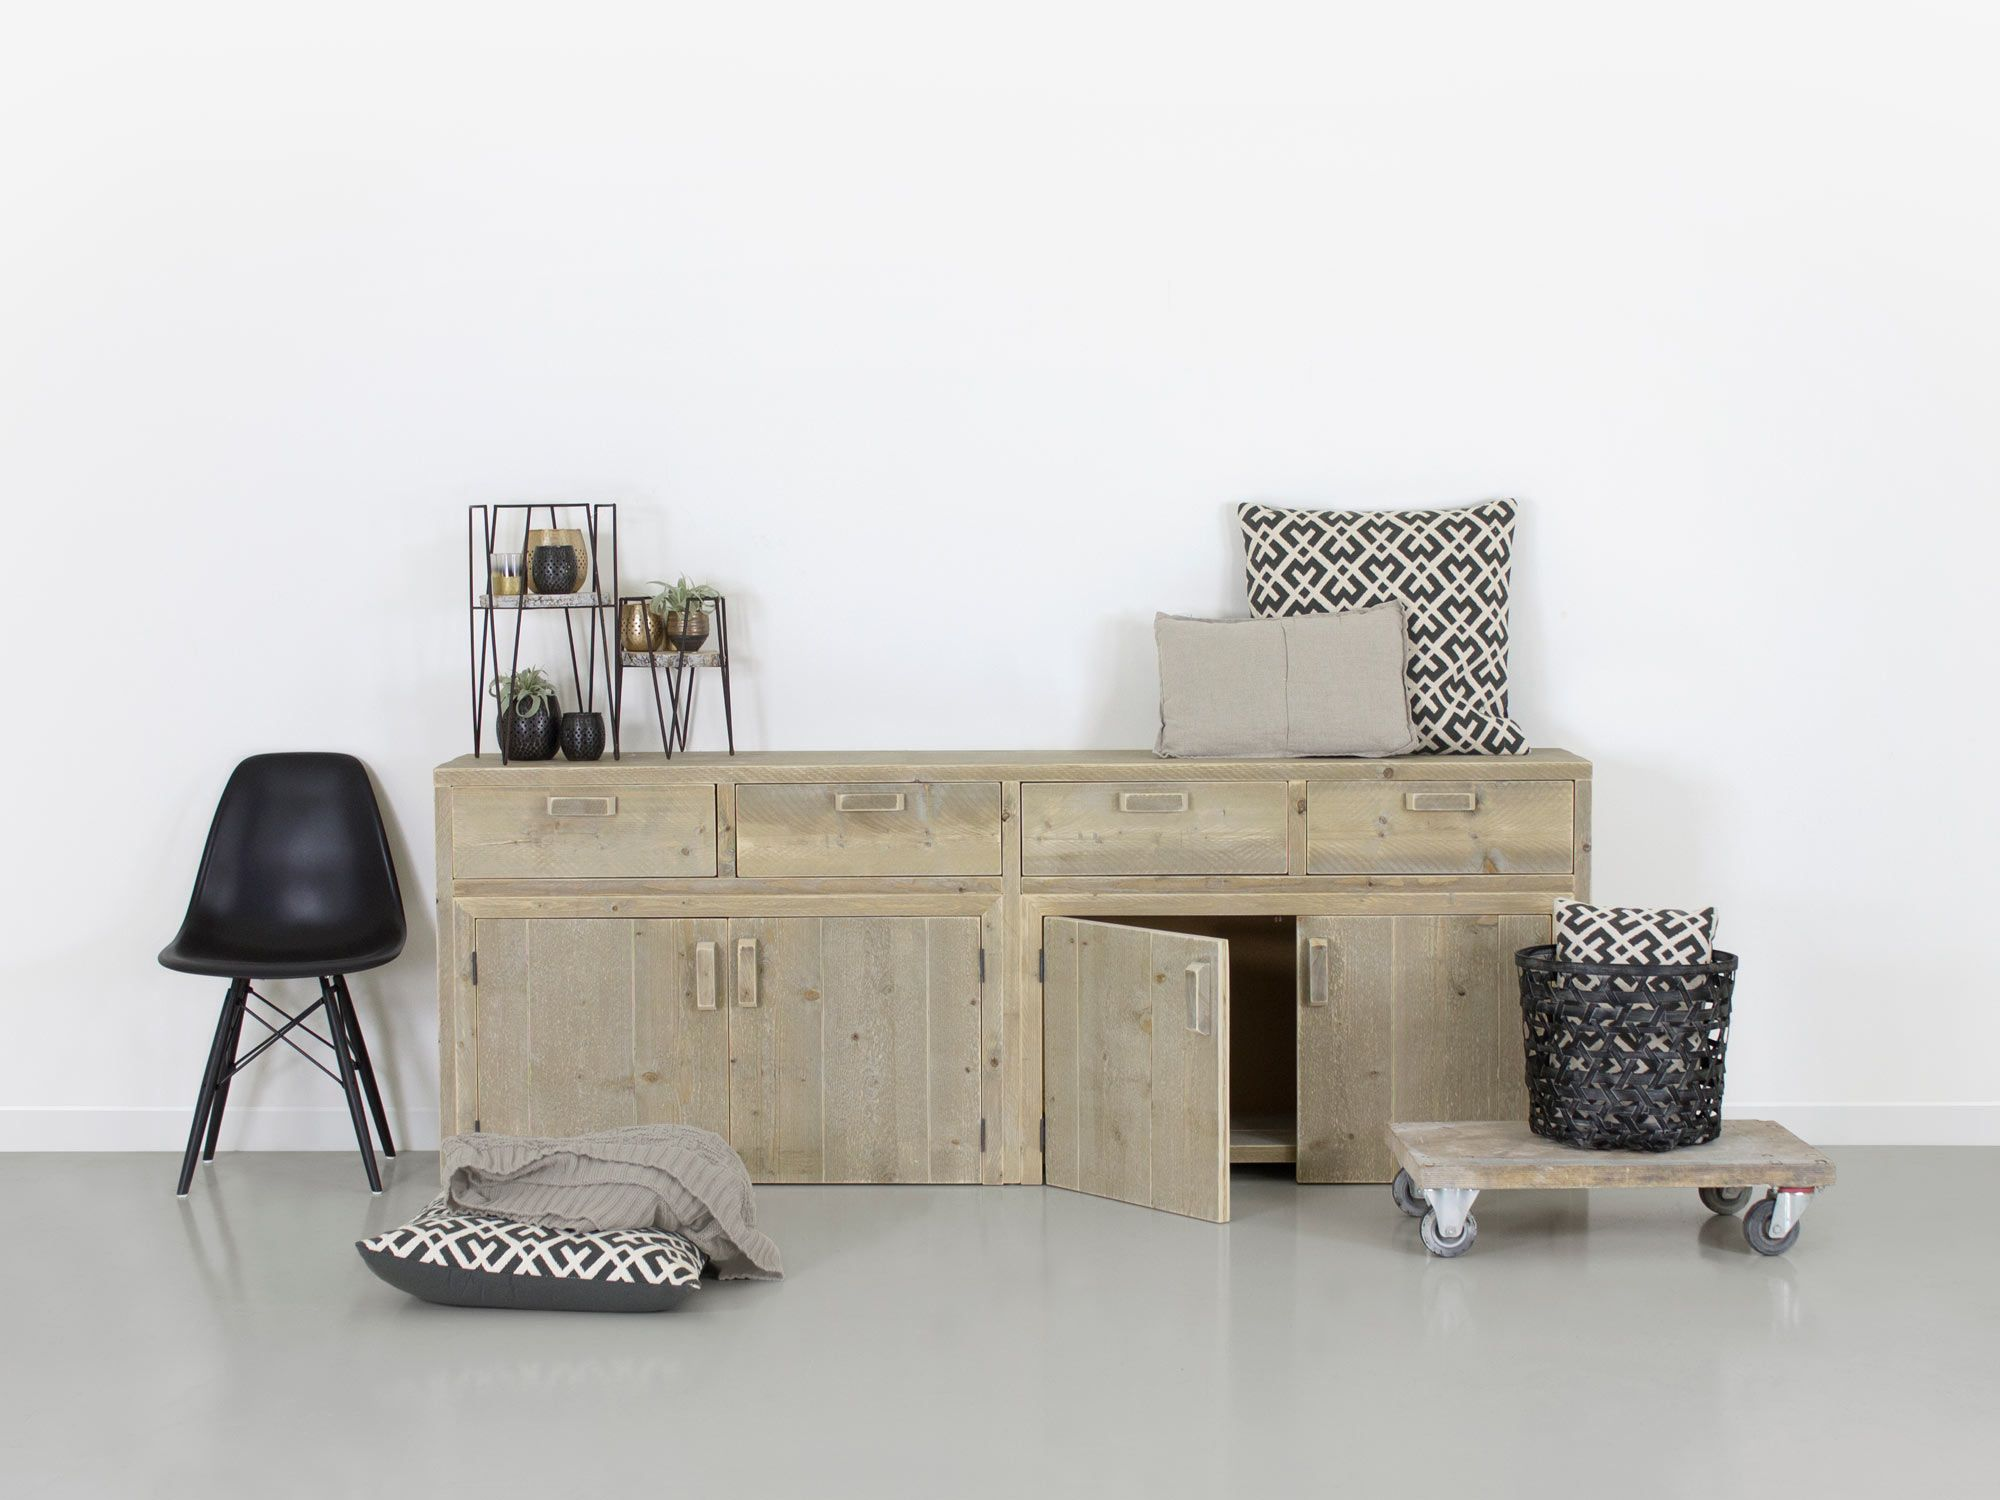 Wohnideen Büro Im Wohnzimmer bauholz kommode alma bauholz möbel design küche